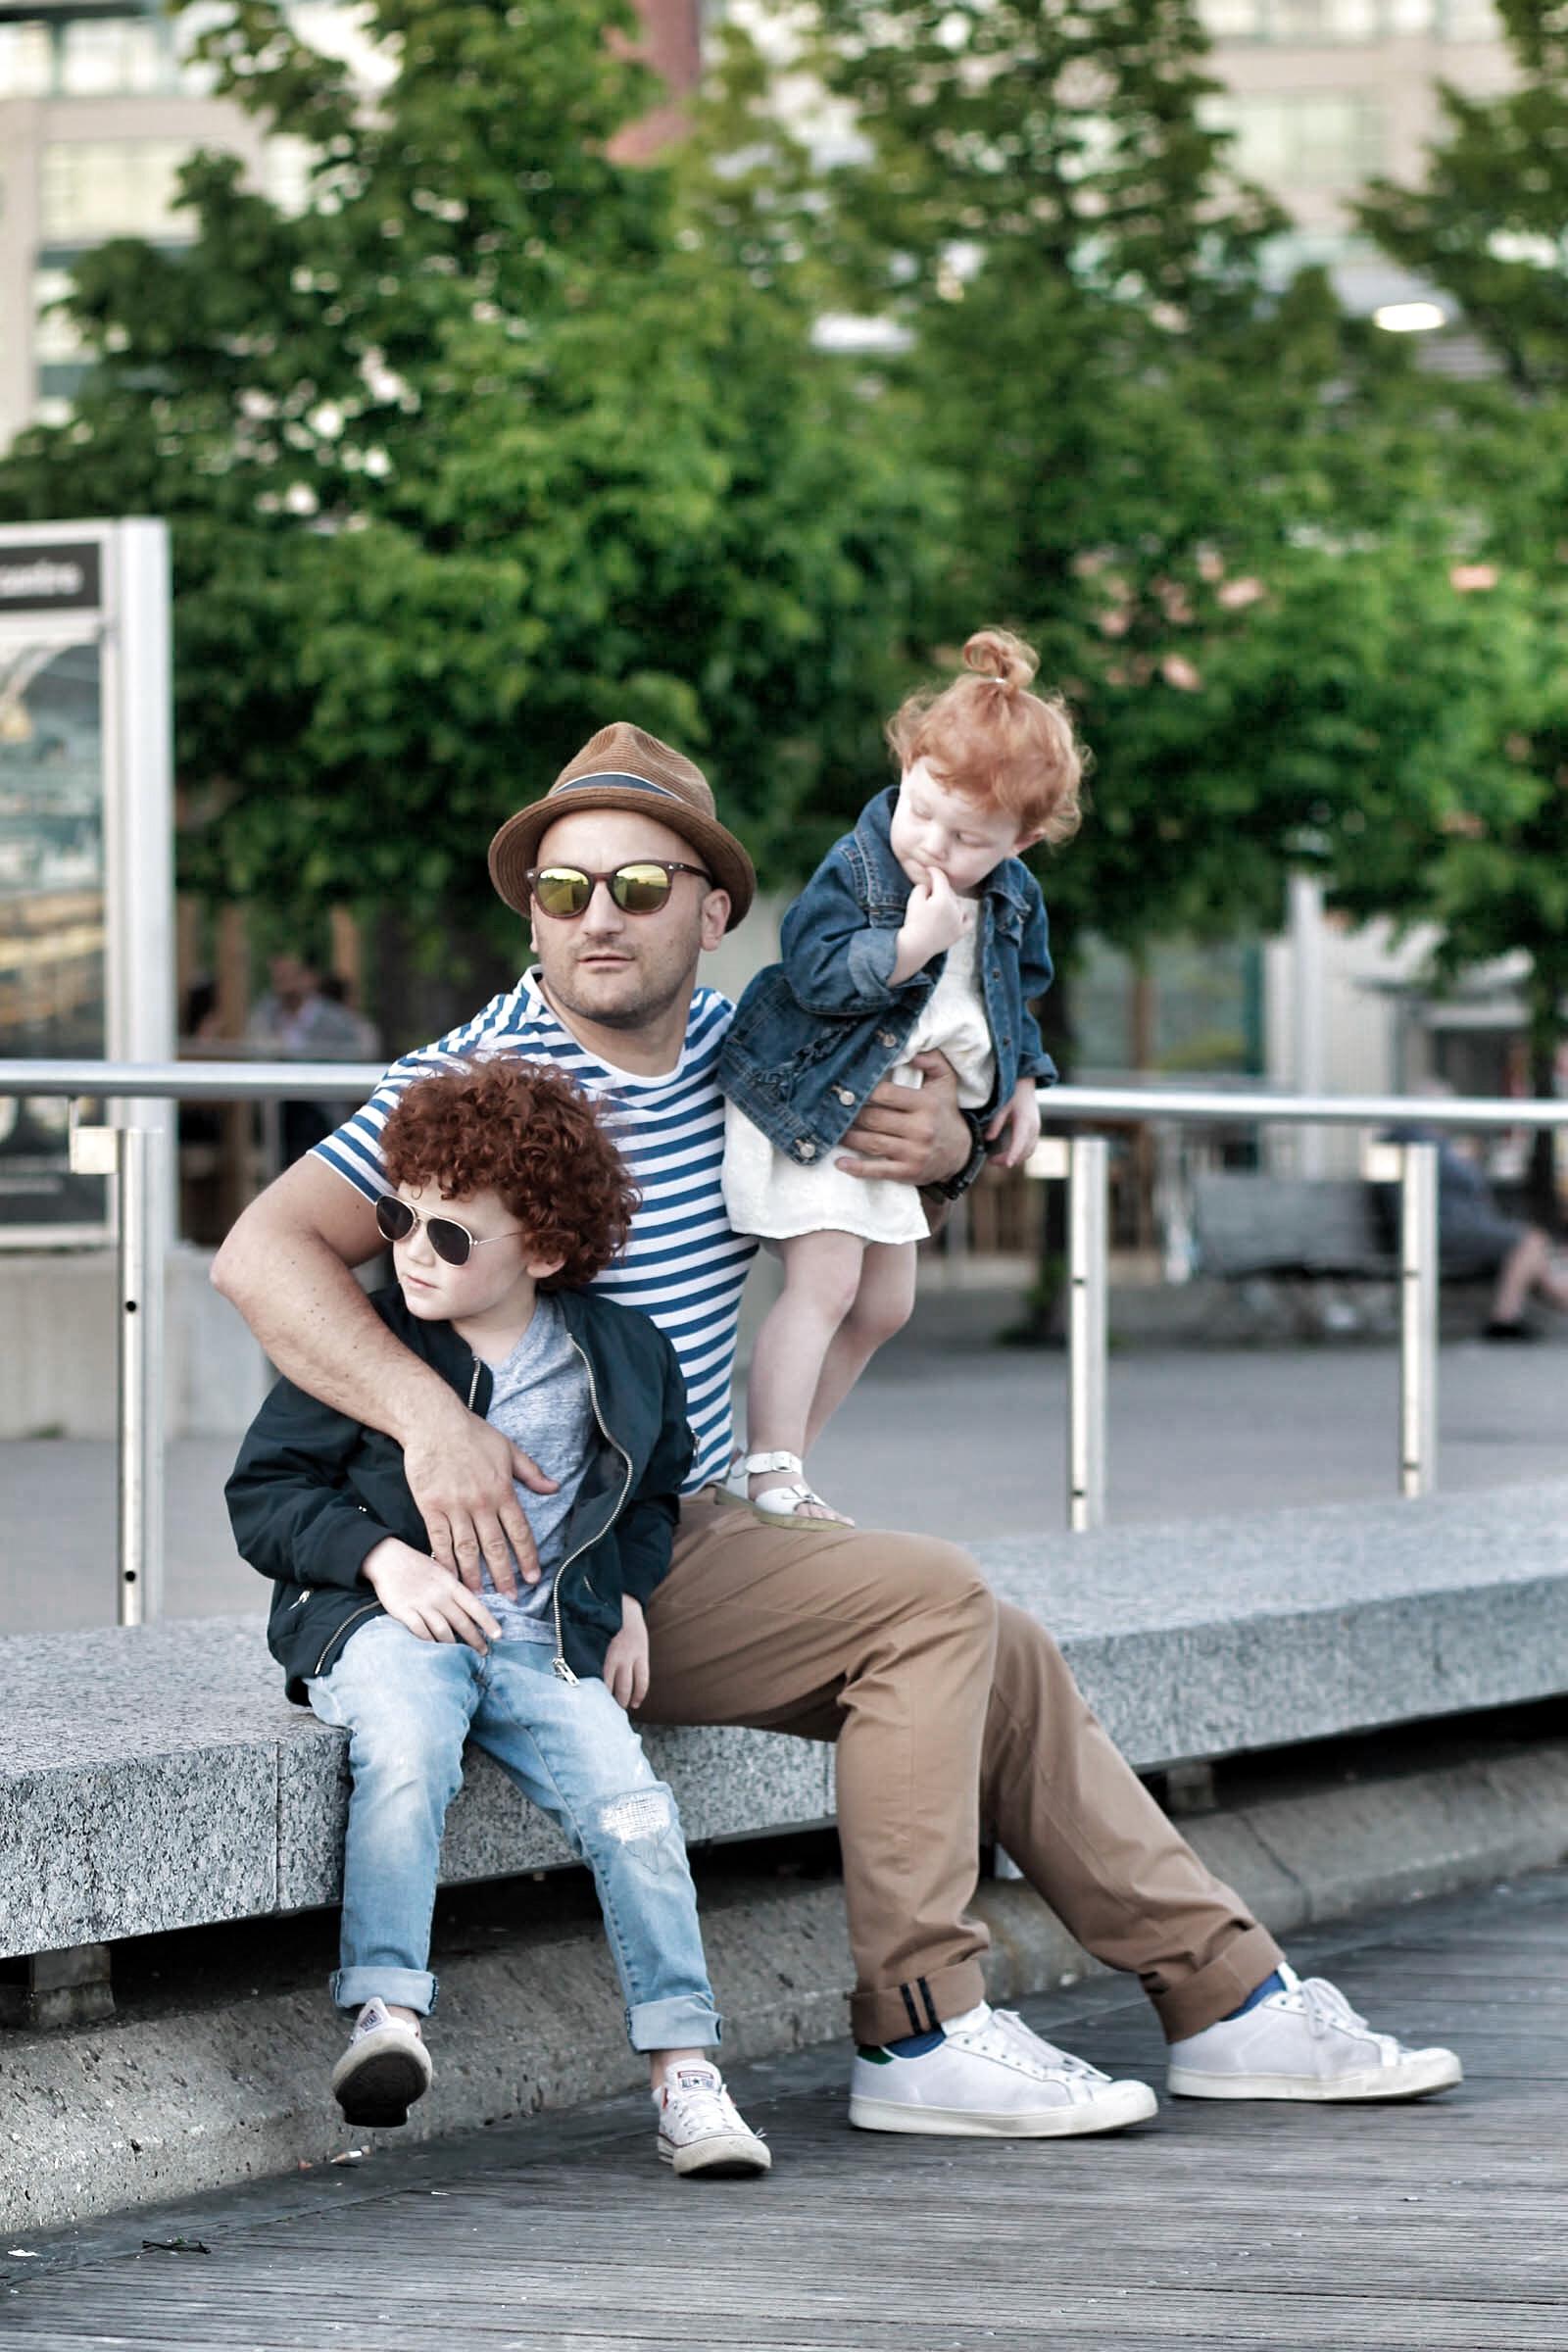 RW&CO Breton striped t-shirt + Father's Day